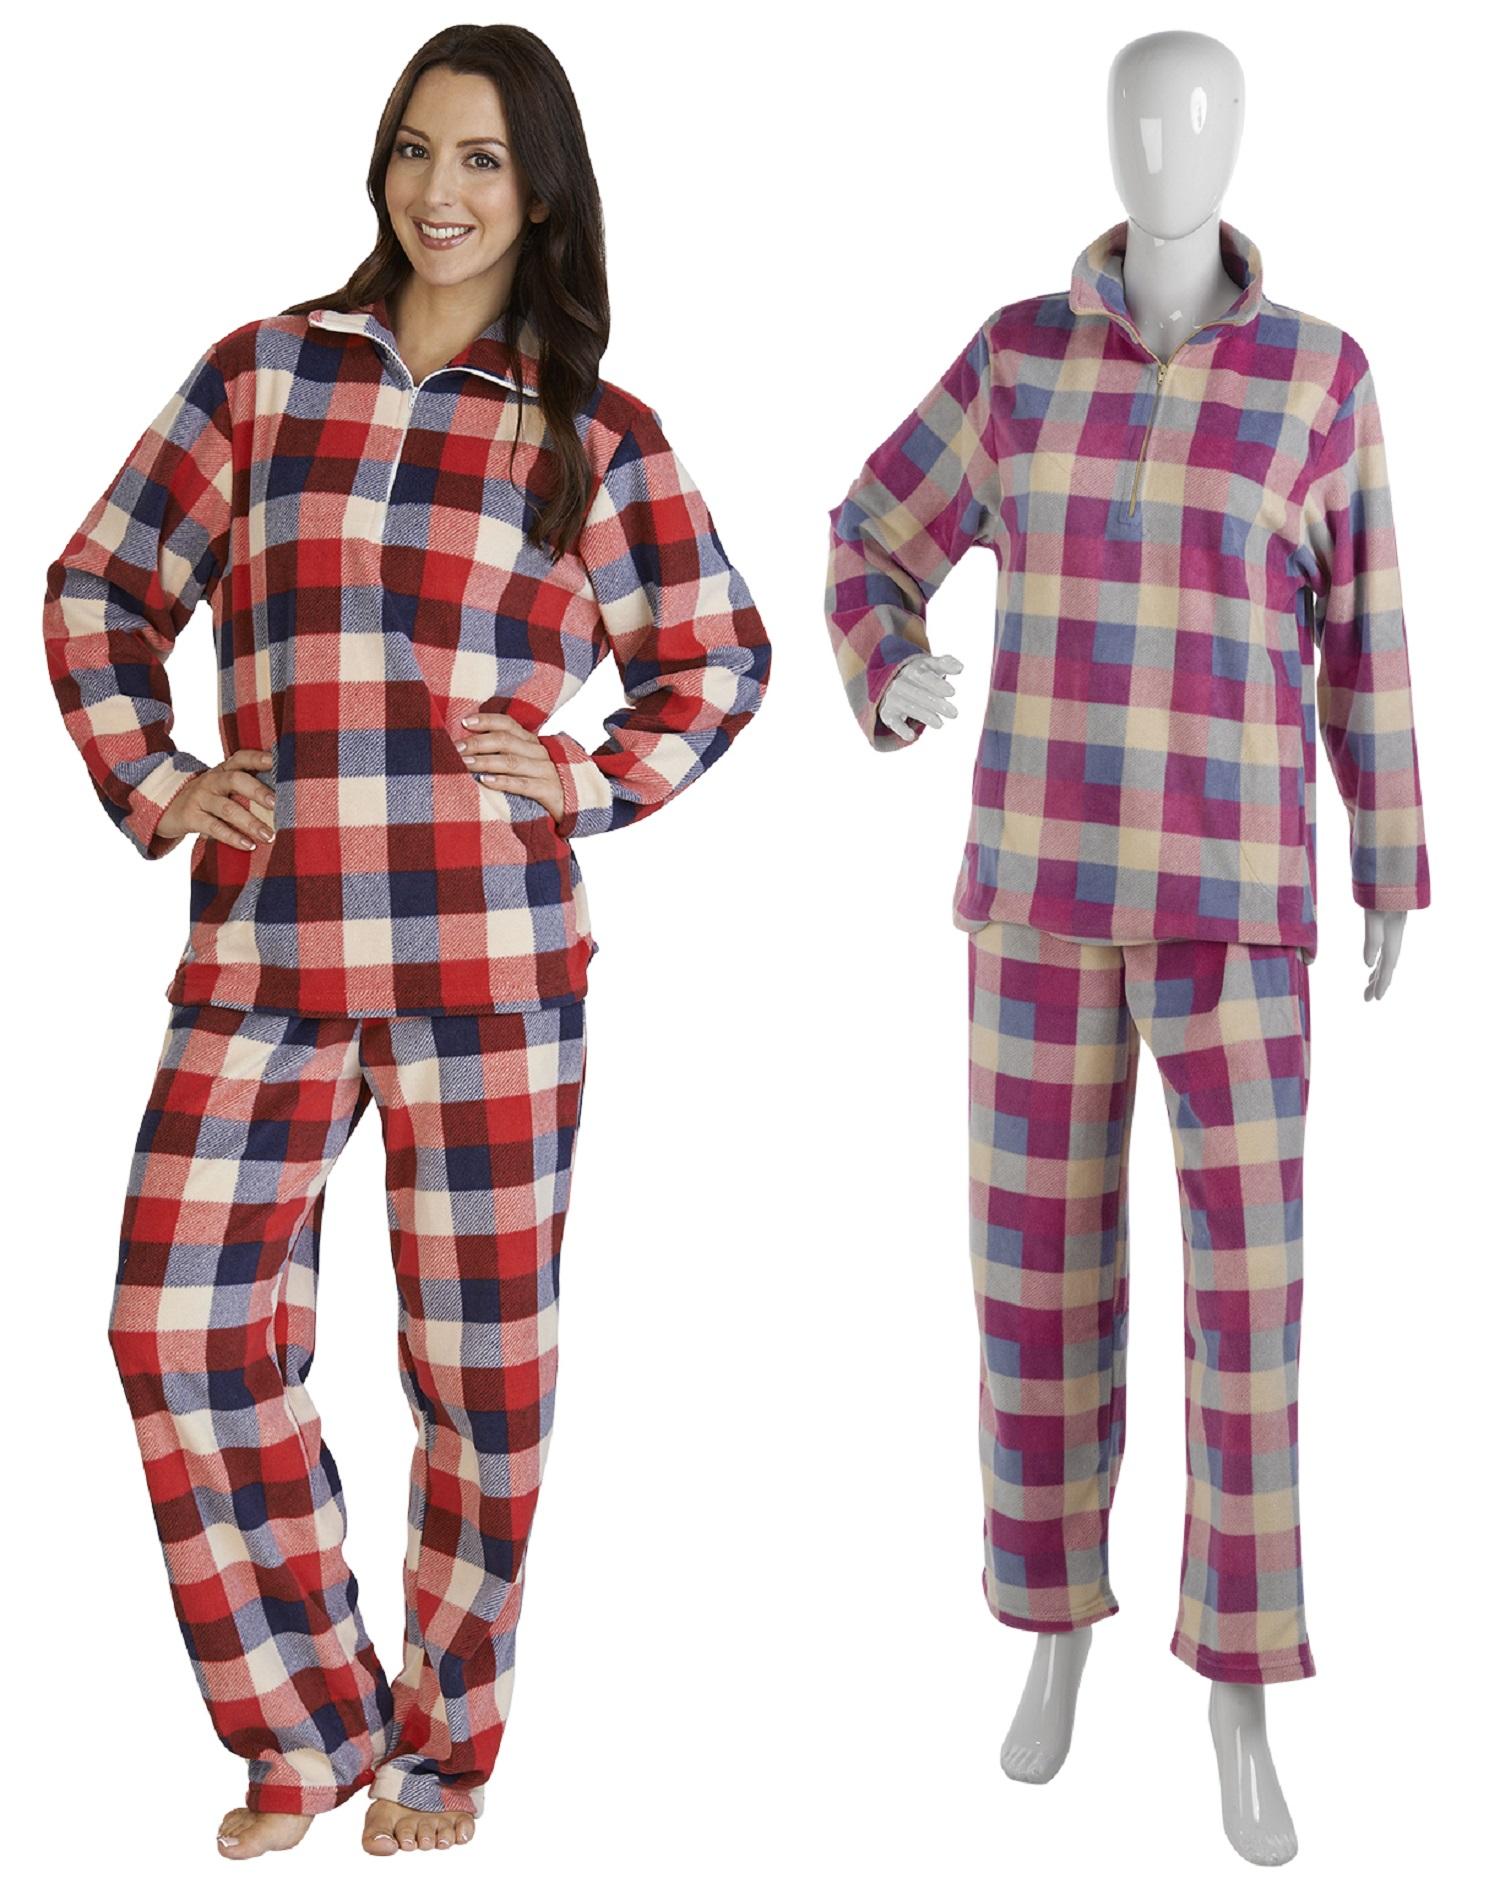 633b8d85a968 Womens Slenderella Checked Micro Fleece Pyjamas Ladies Warm Check Loungewear  PJs